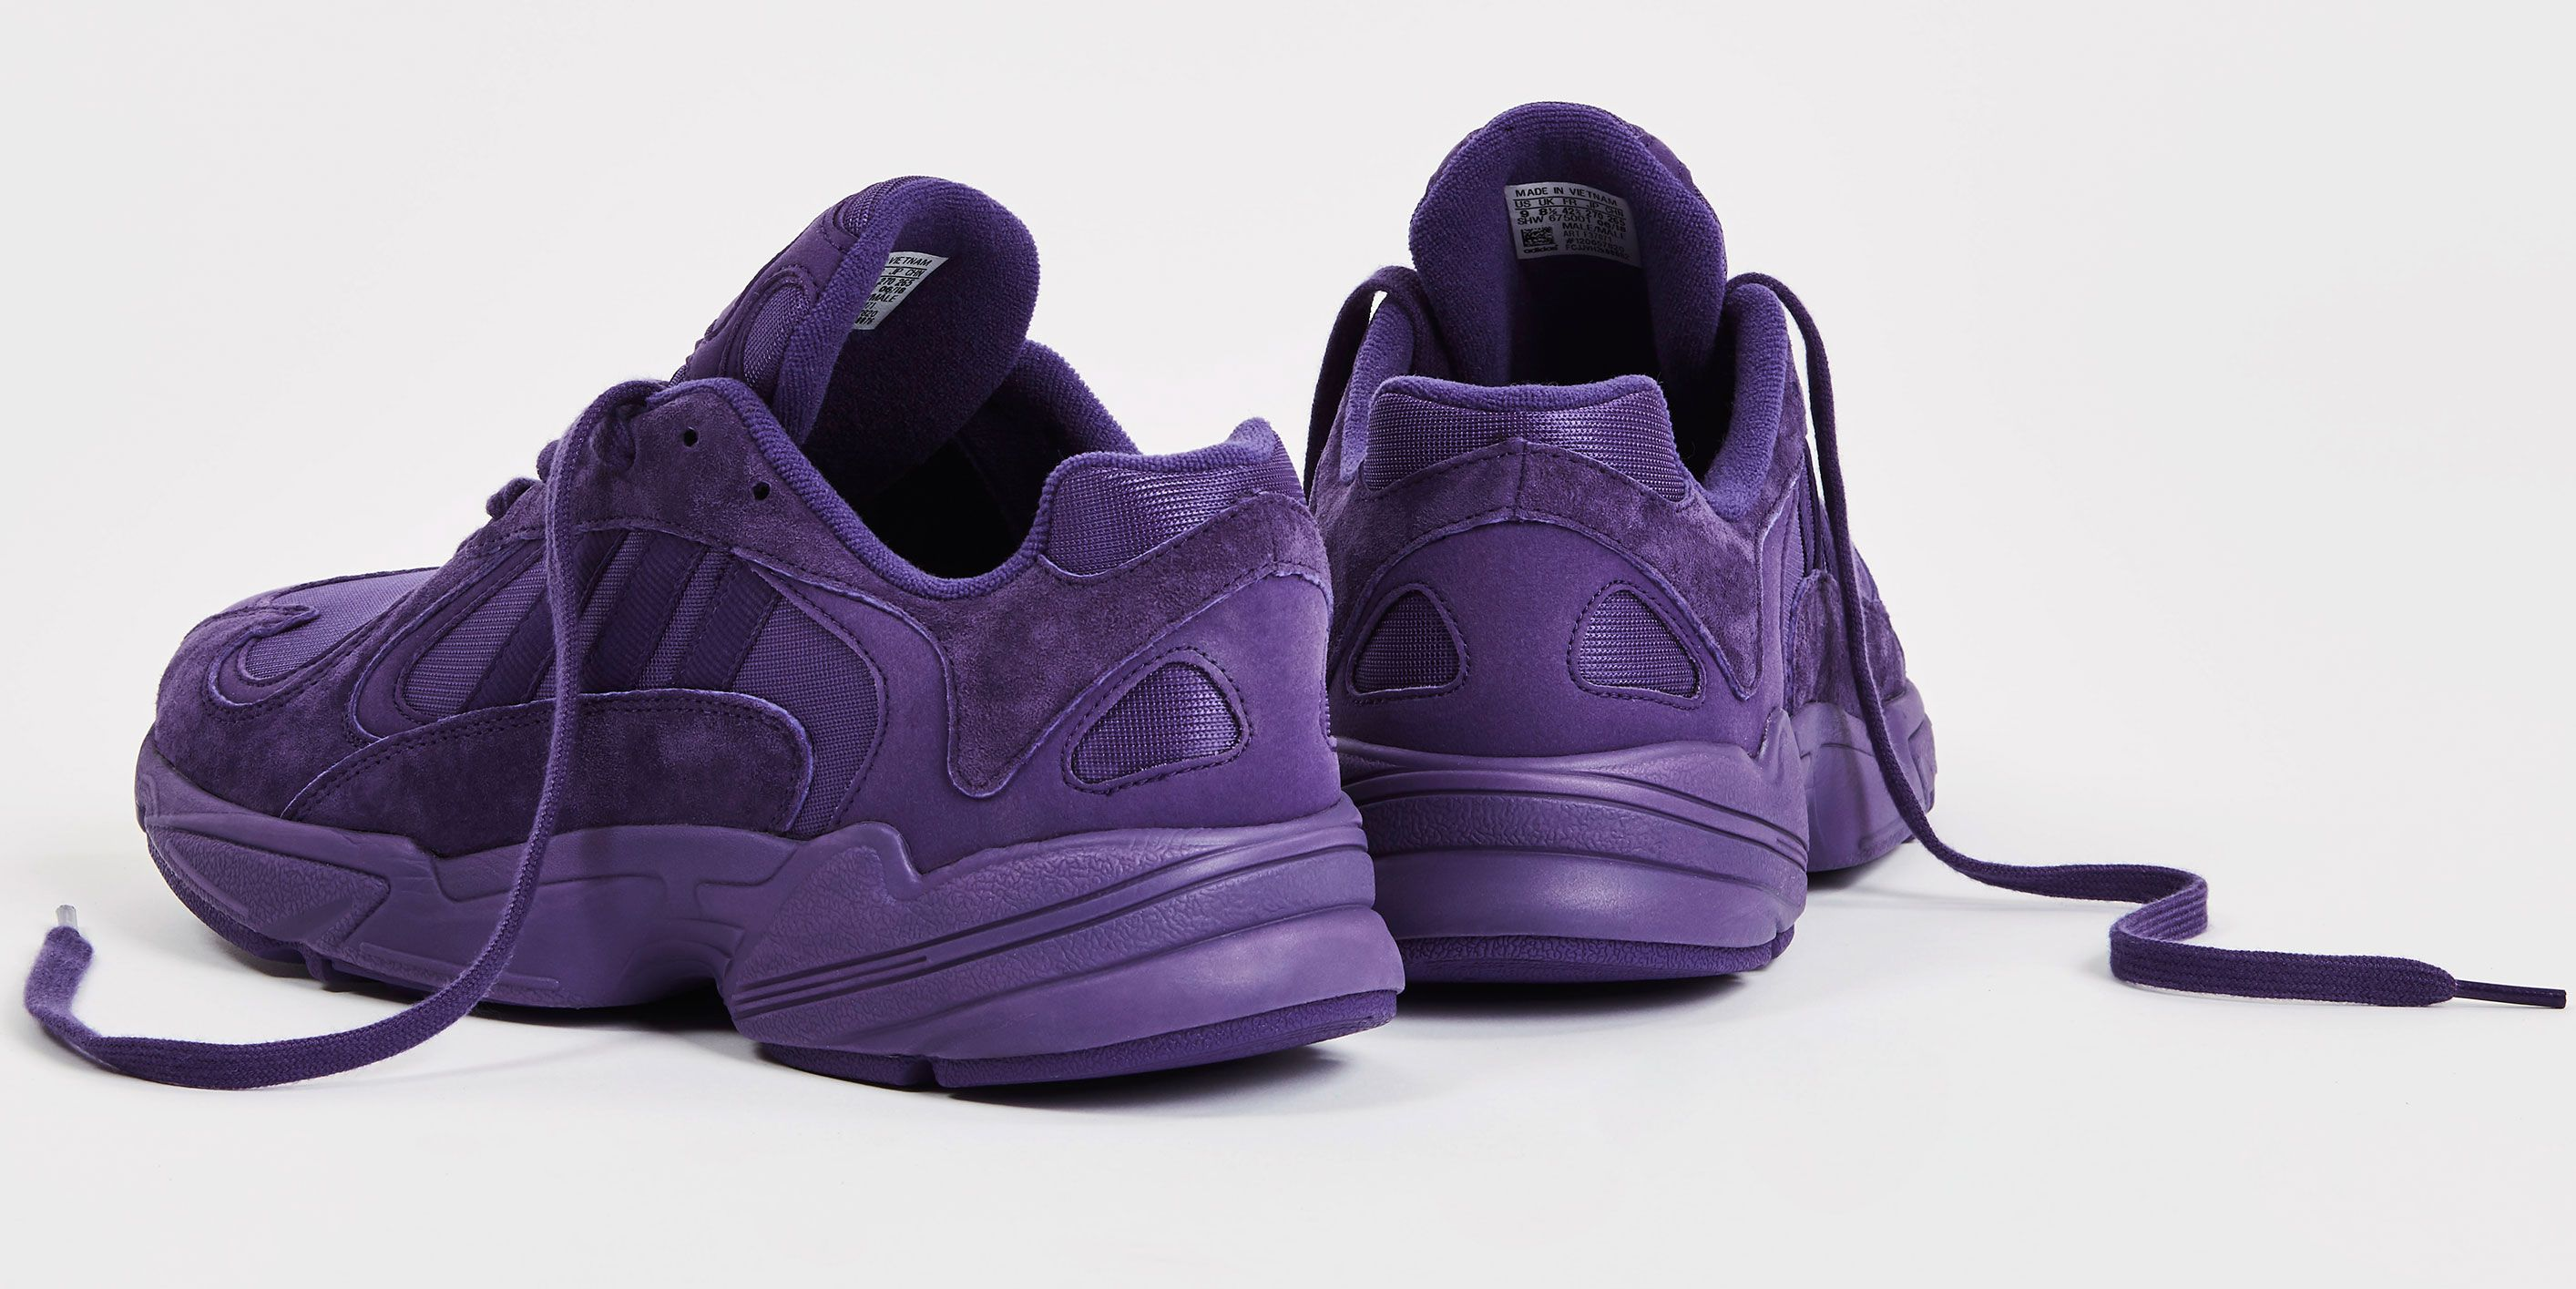 this week\u0027s biggest sneaker releases, and where to get them  Neu Adidas Mystery Ink Bademntel Herren Online Bestellen P 1901 #4